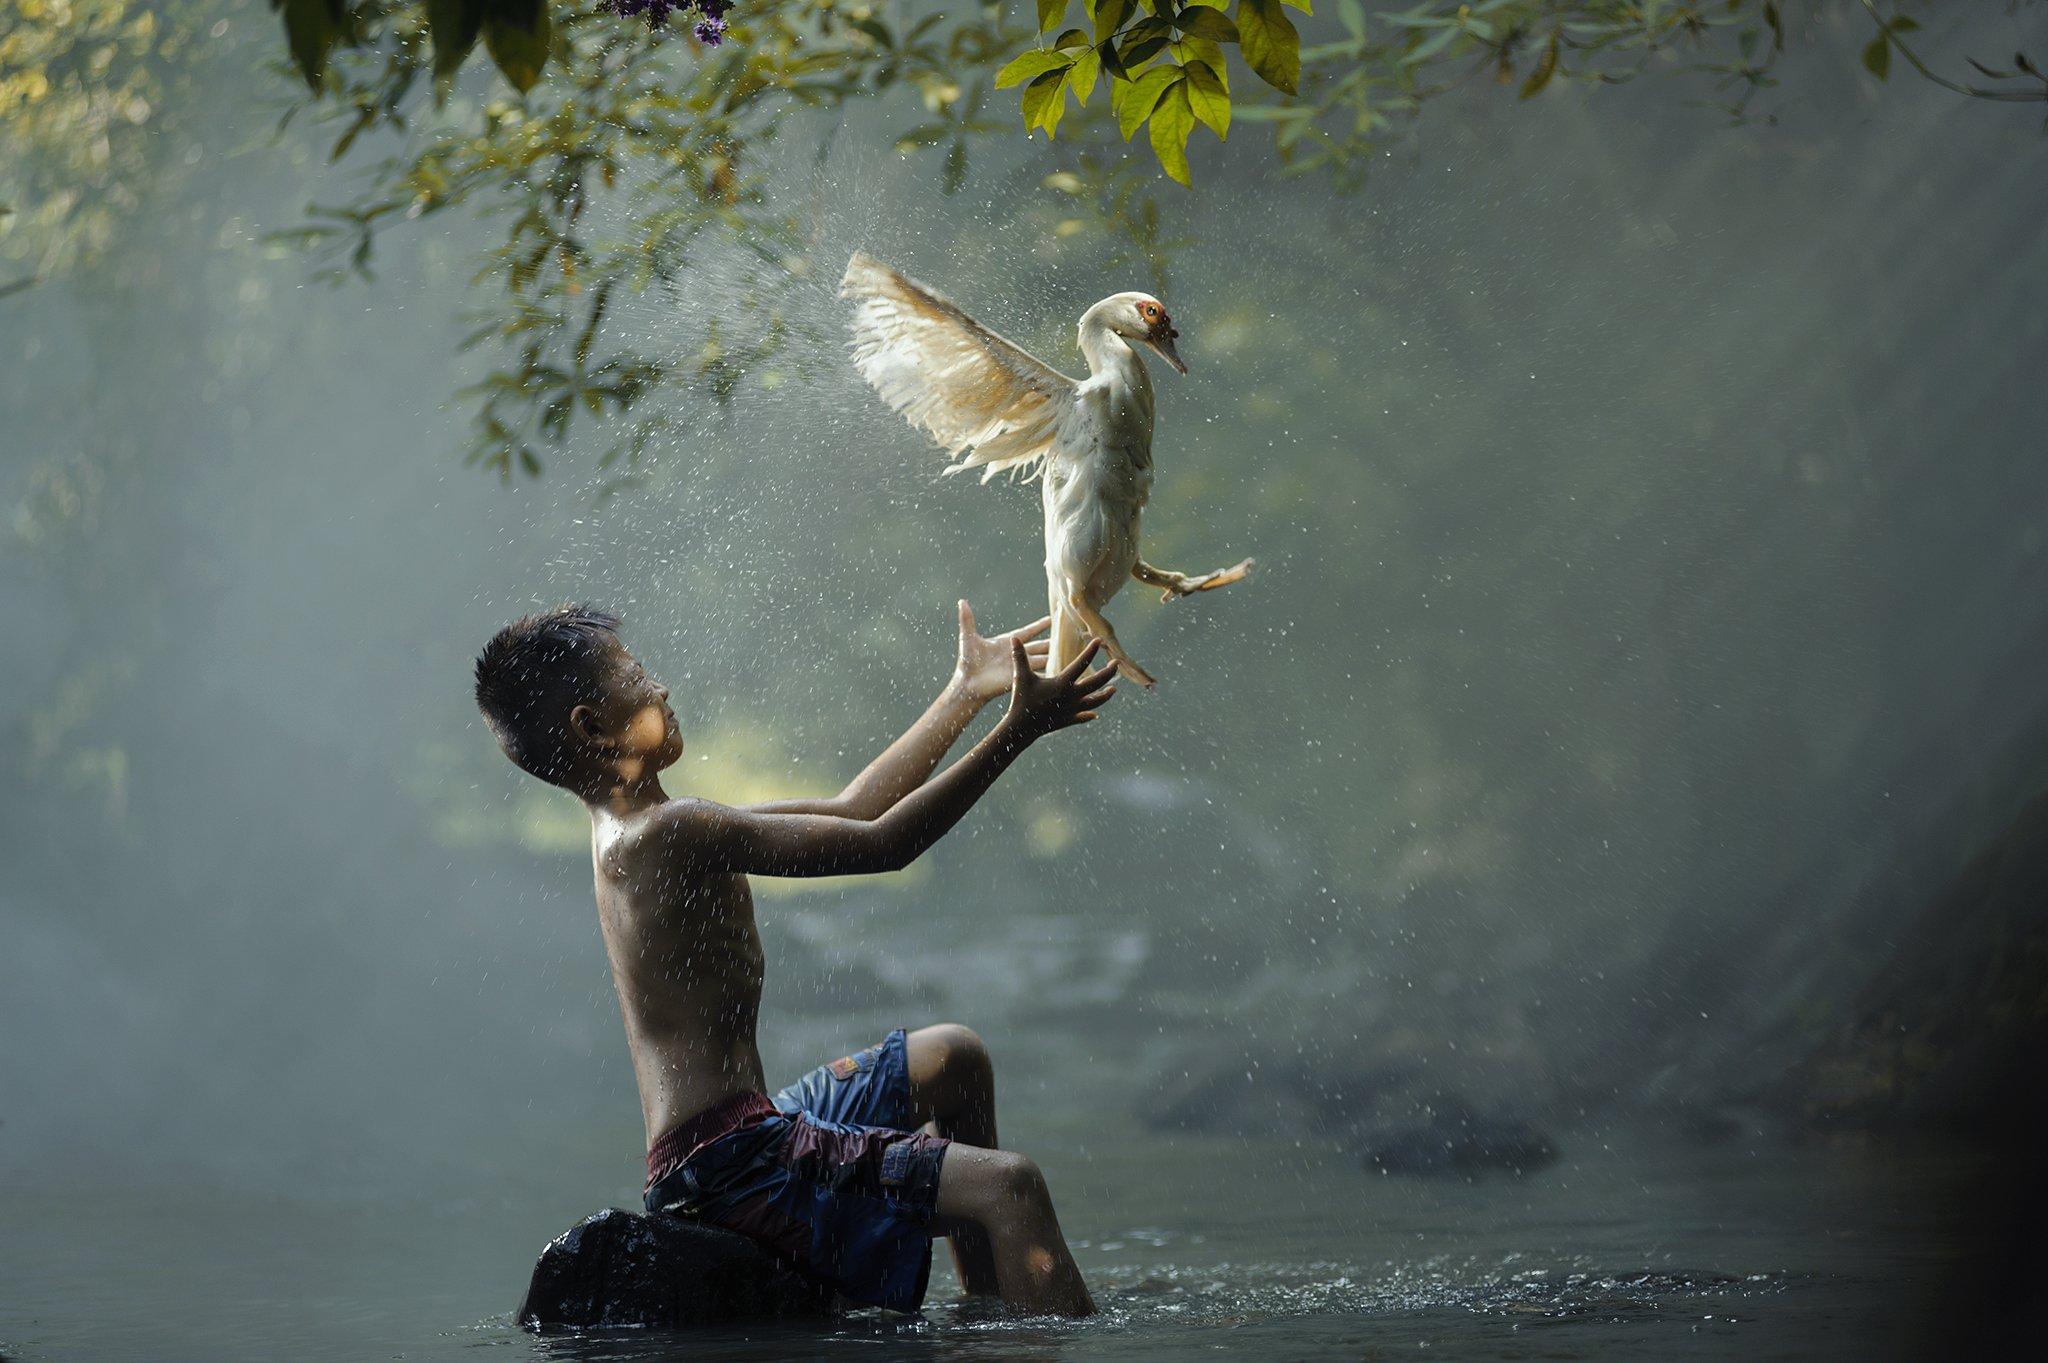 Action, Animals, Asia, Asian, Boy, Child, Children, Duck, Fun, Green, Life, Lucky, River, Water, Waterfall, Wildlife, Saravut Whanset